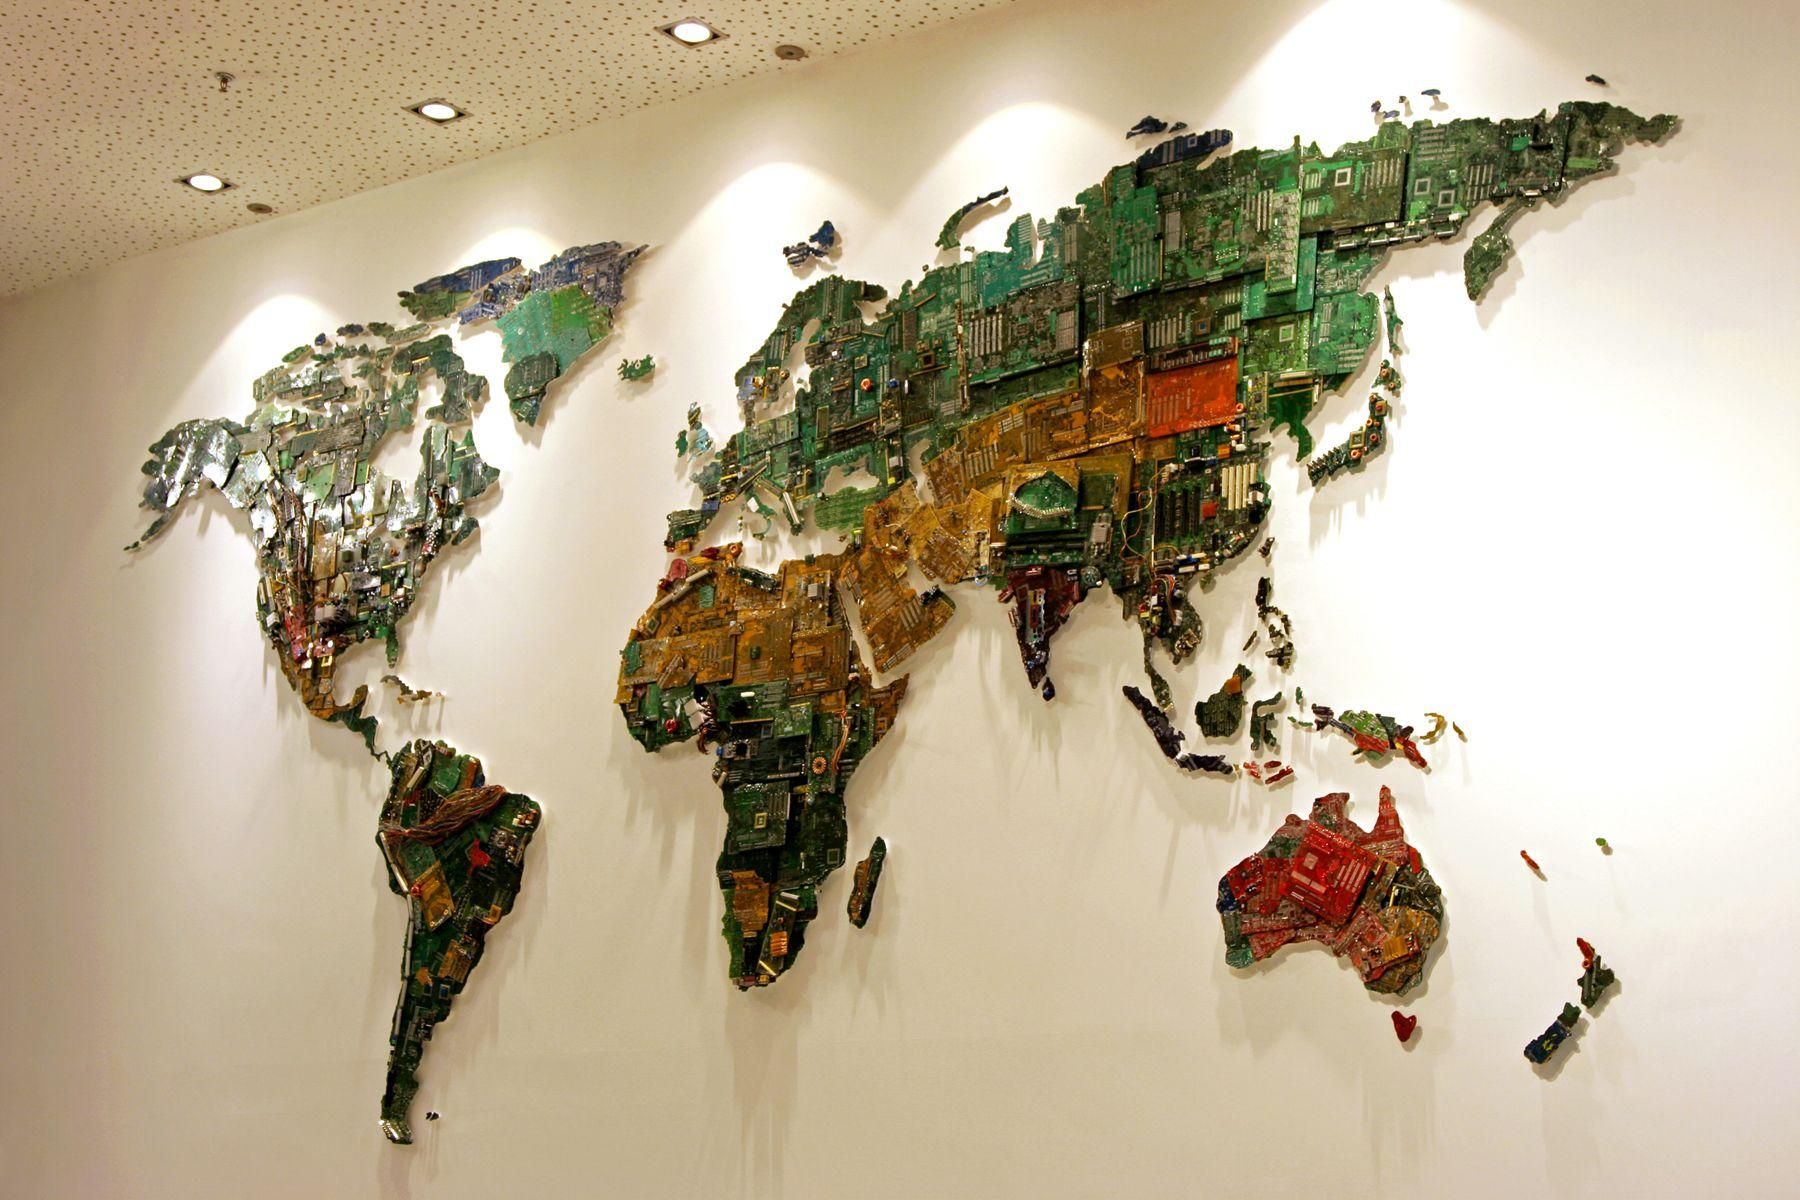 6a00d8341c5dea53ef015436d42f2d970c pi 1800 1200 for World map wall art